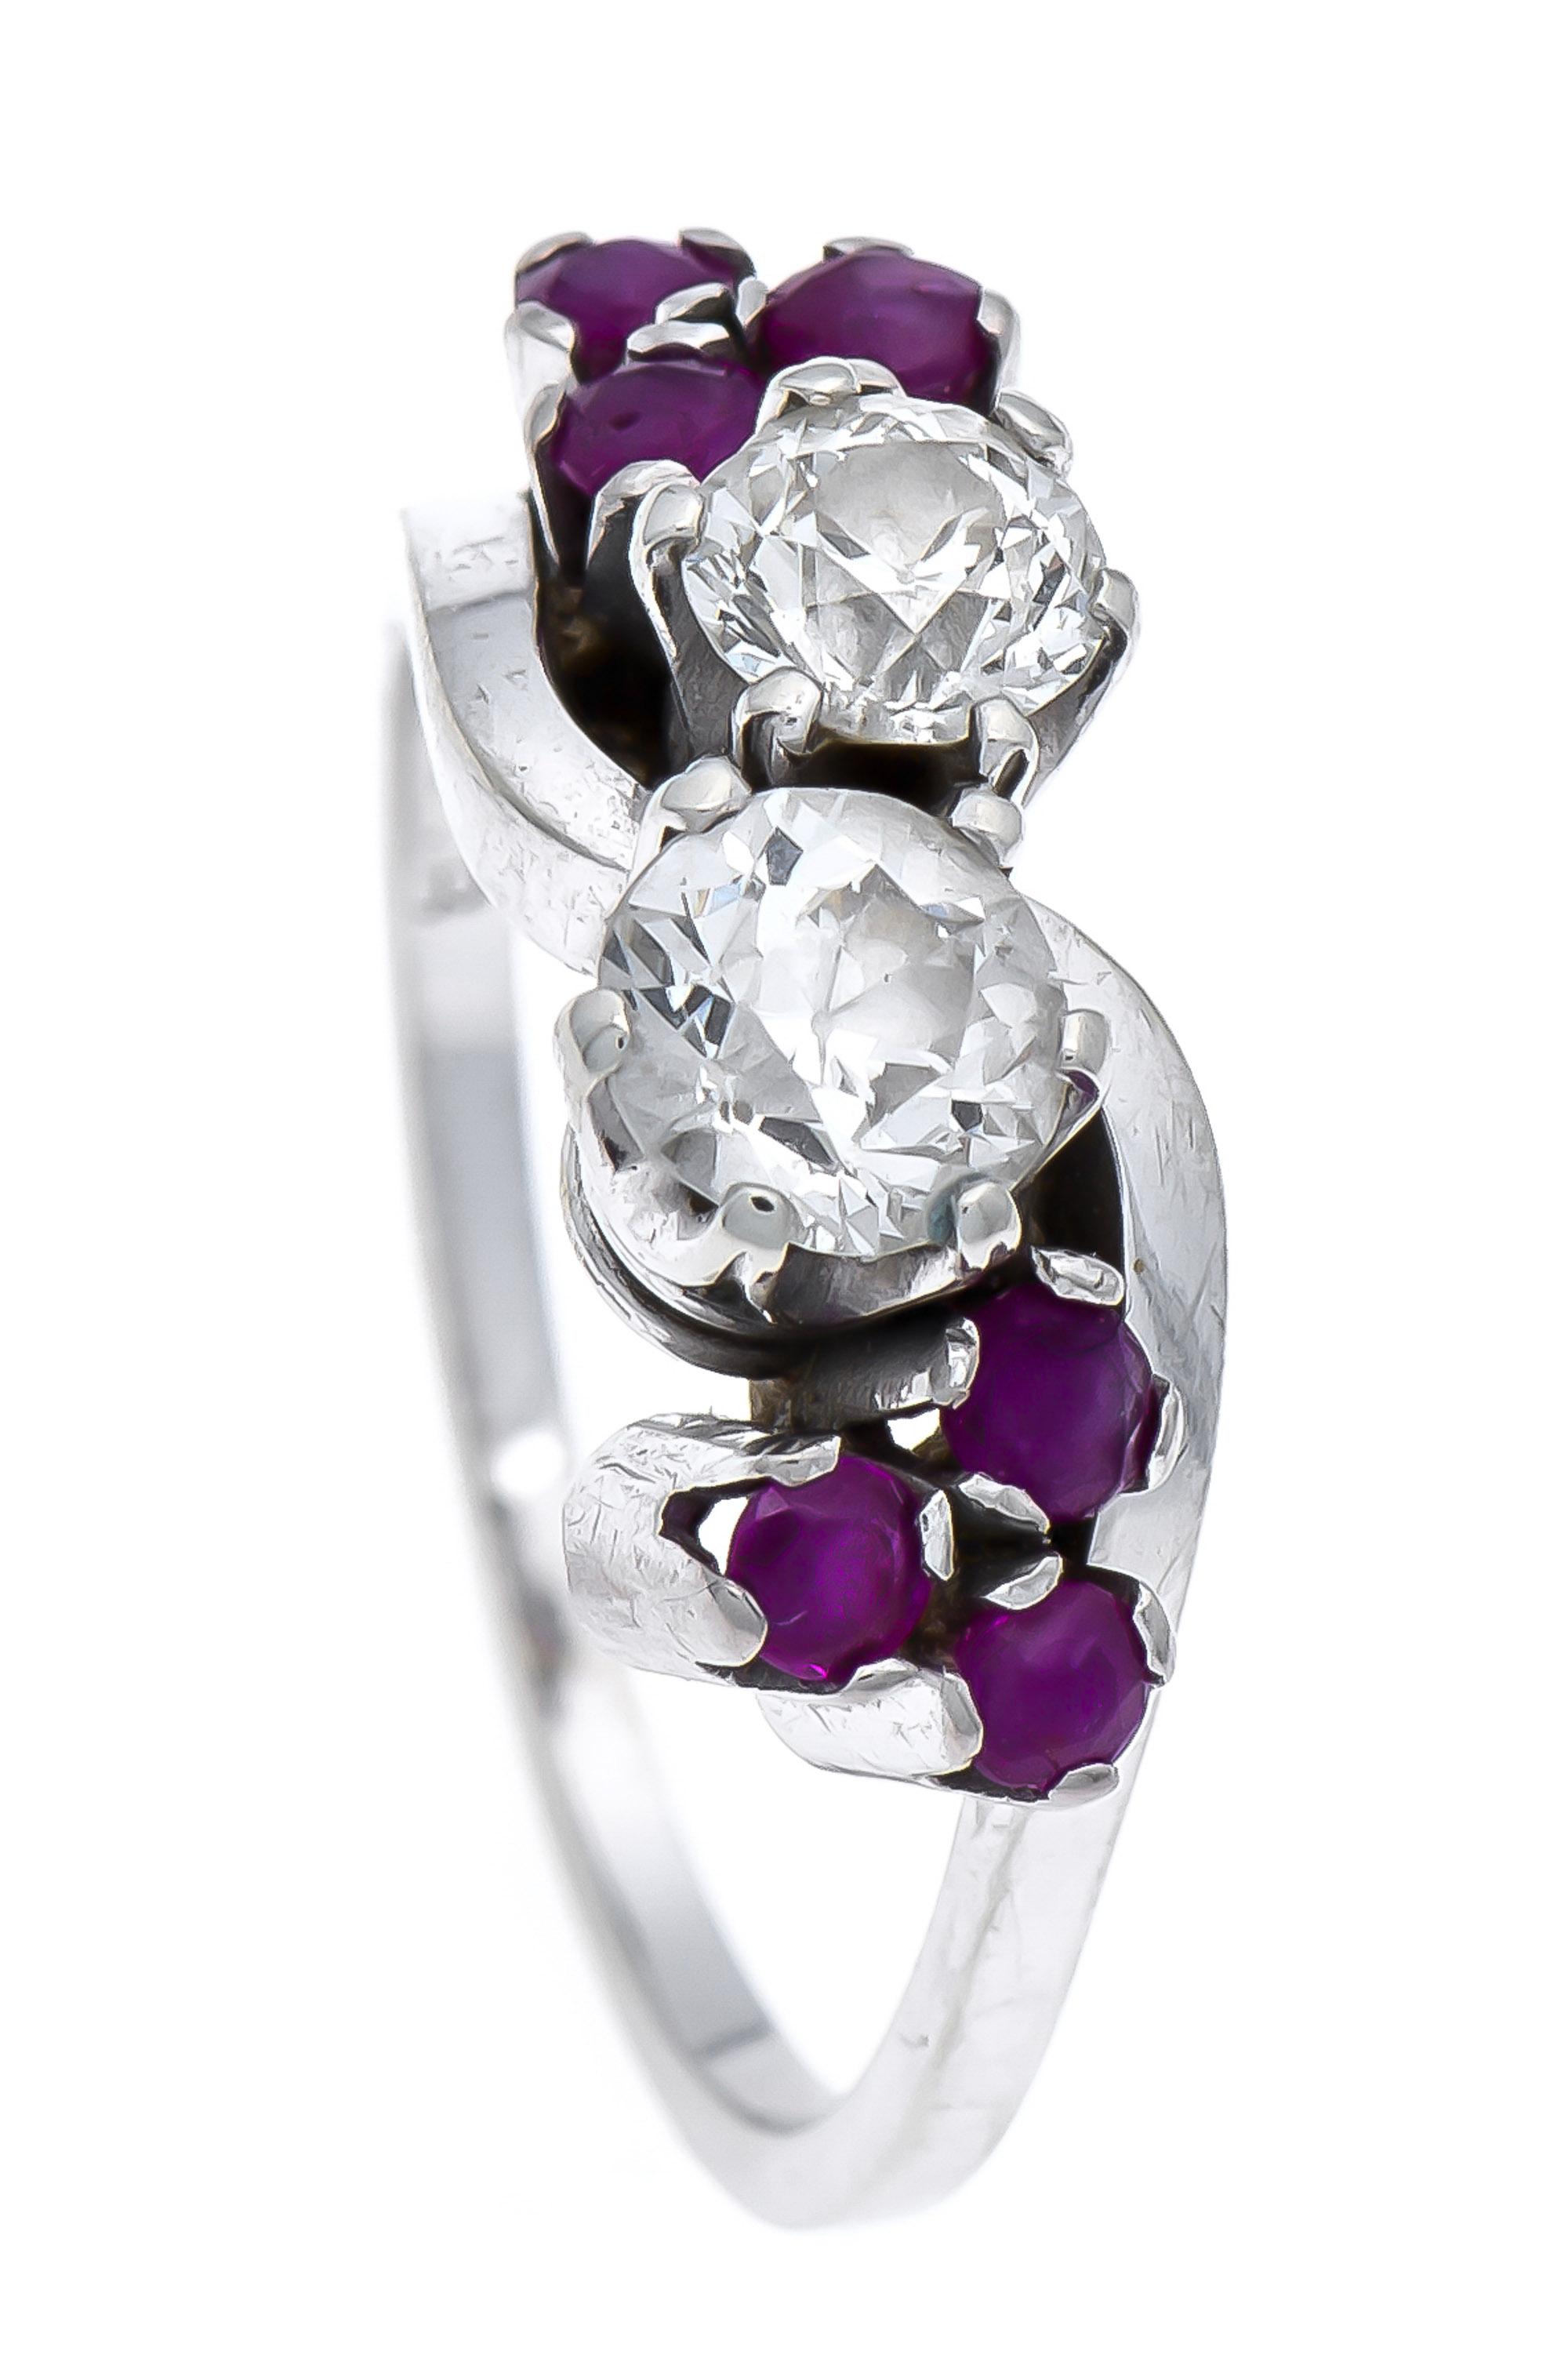 Altschliff-Diamant-Rubin-Ring